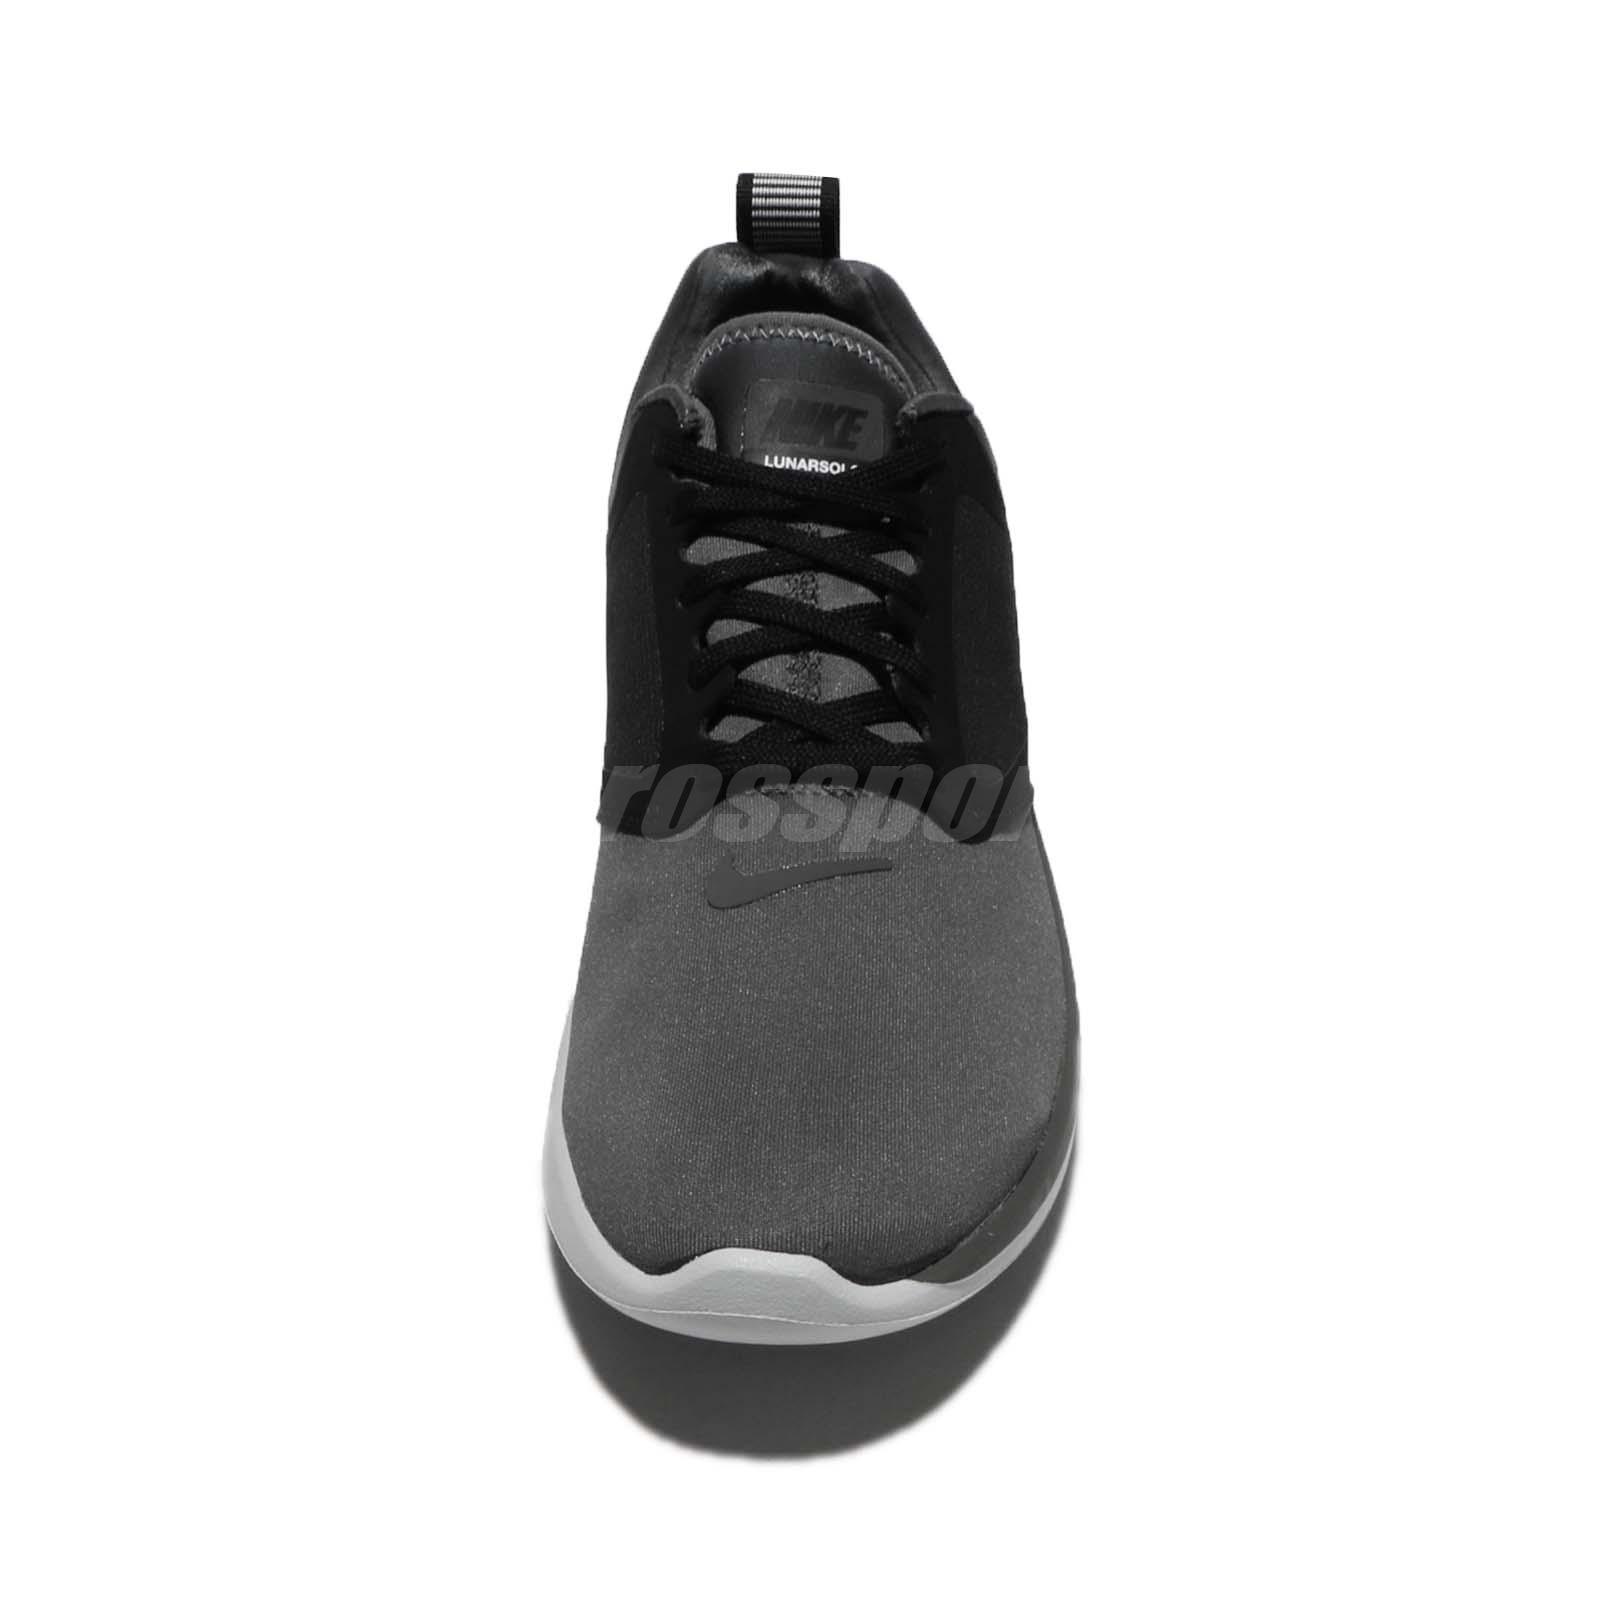 buy popular b311e 187c0 Wmns Nike Lunarsolo Dark Grey Black Women Running Shoes Sneakers ...